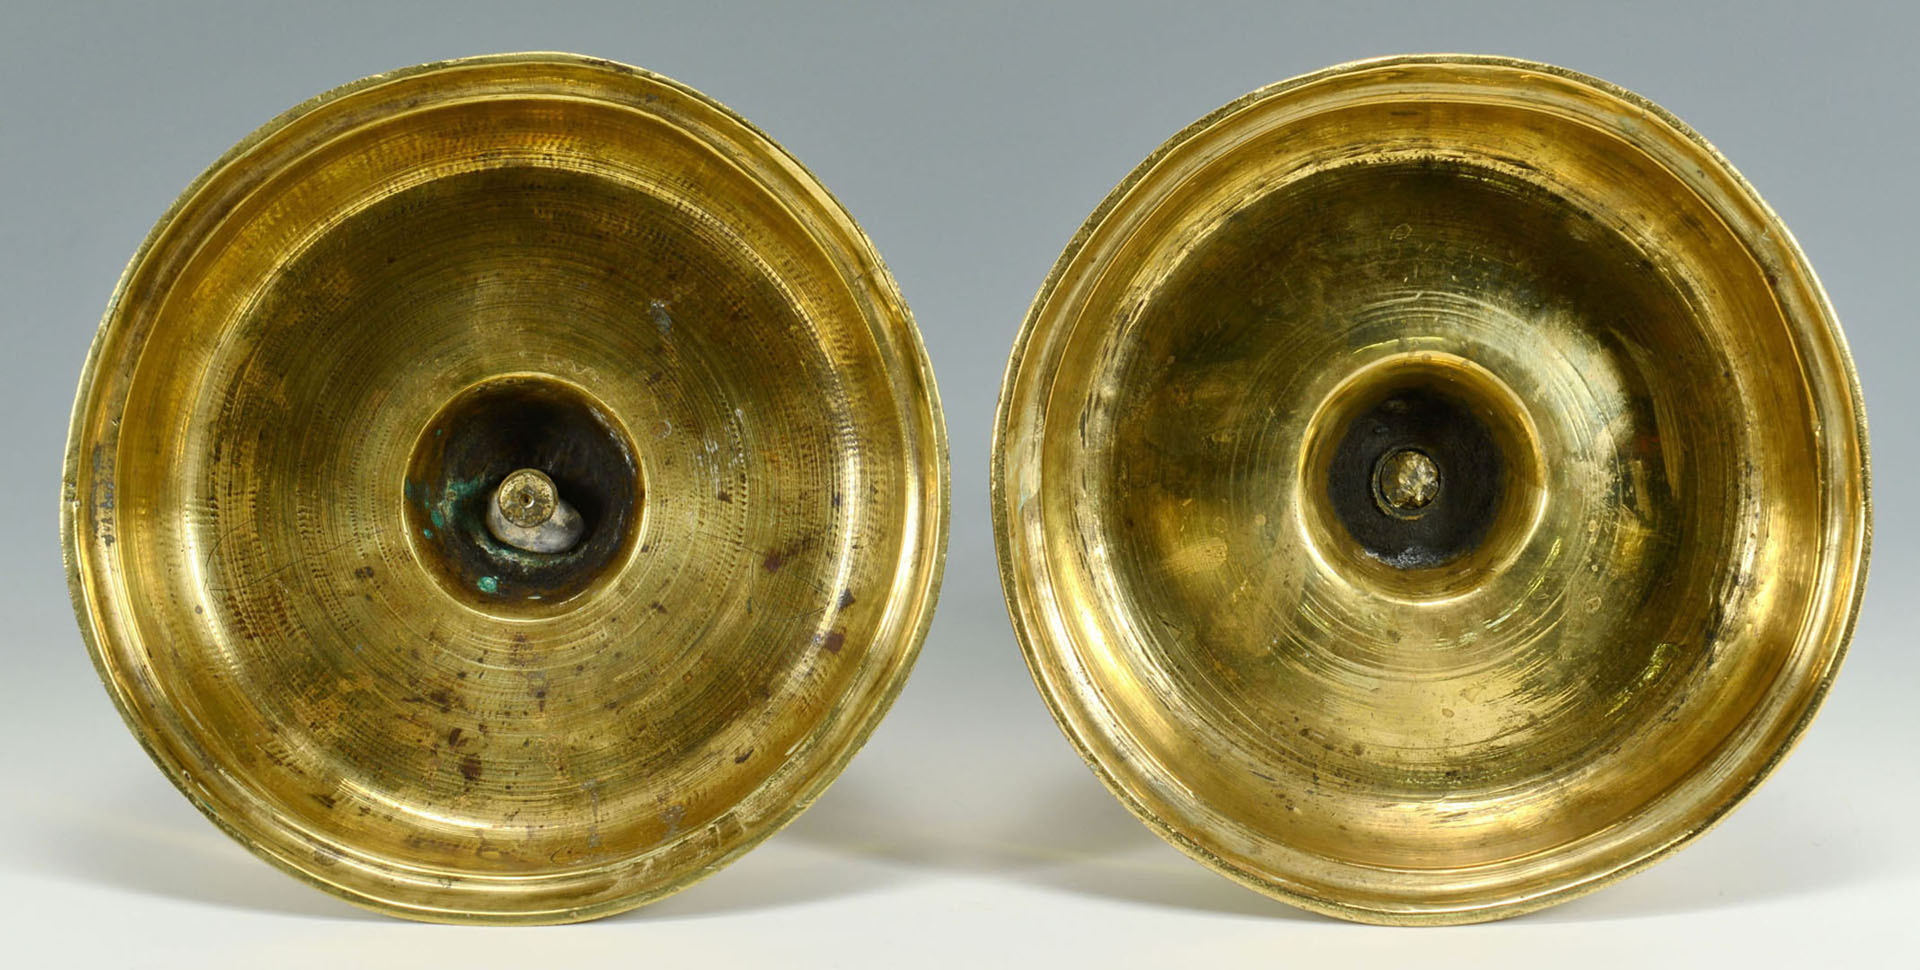 Lot 91: Four 17th century Brass Candlesticks